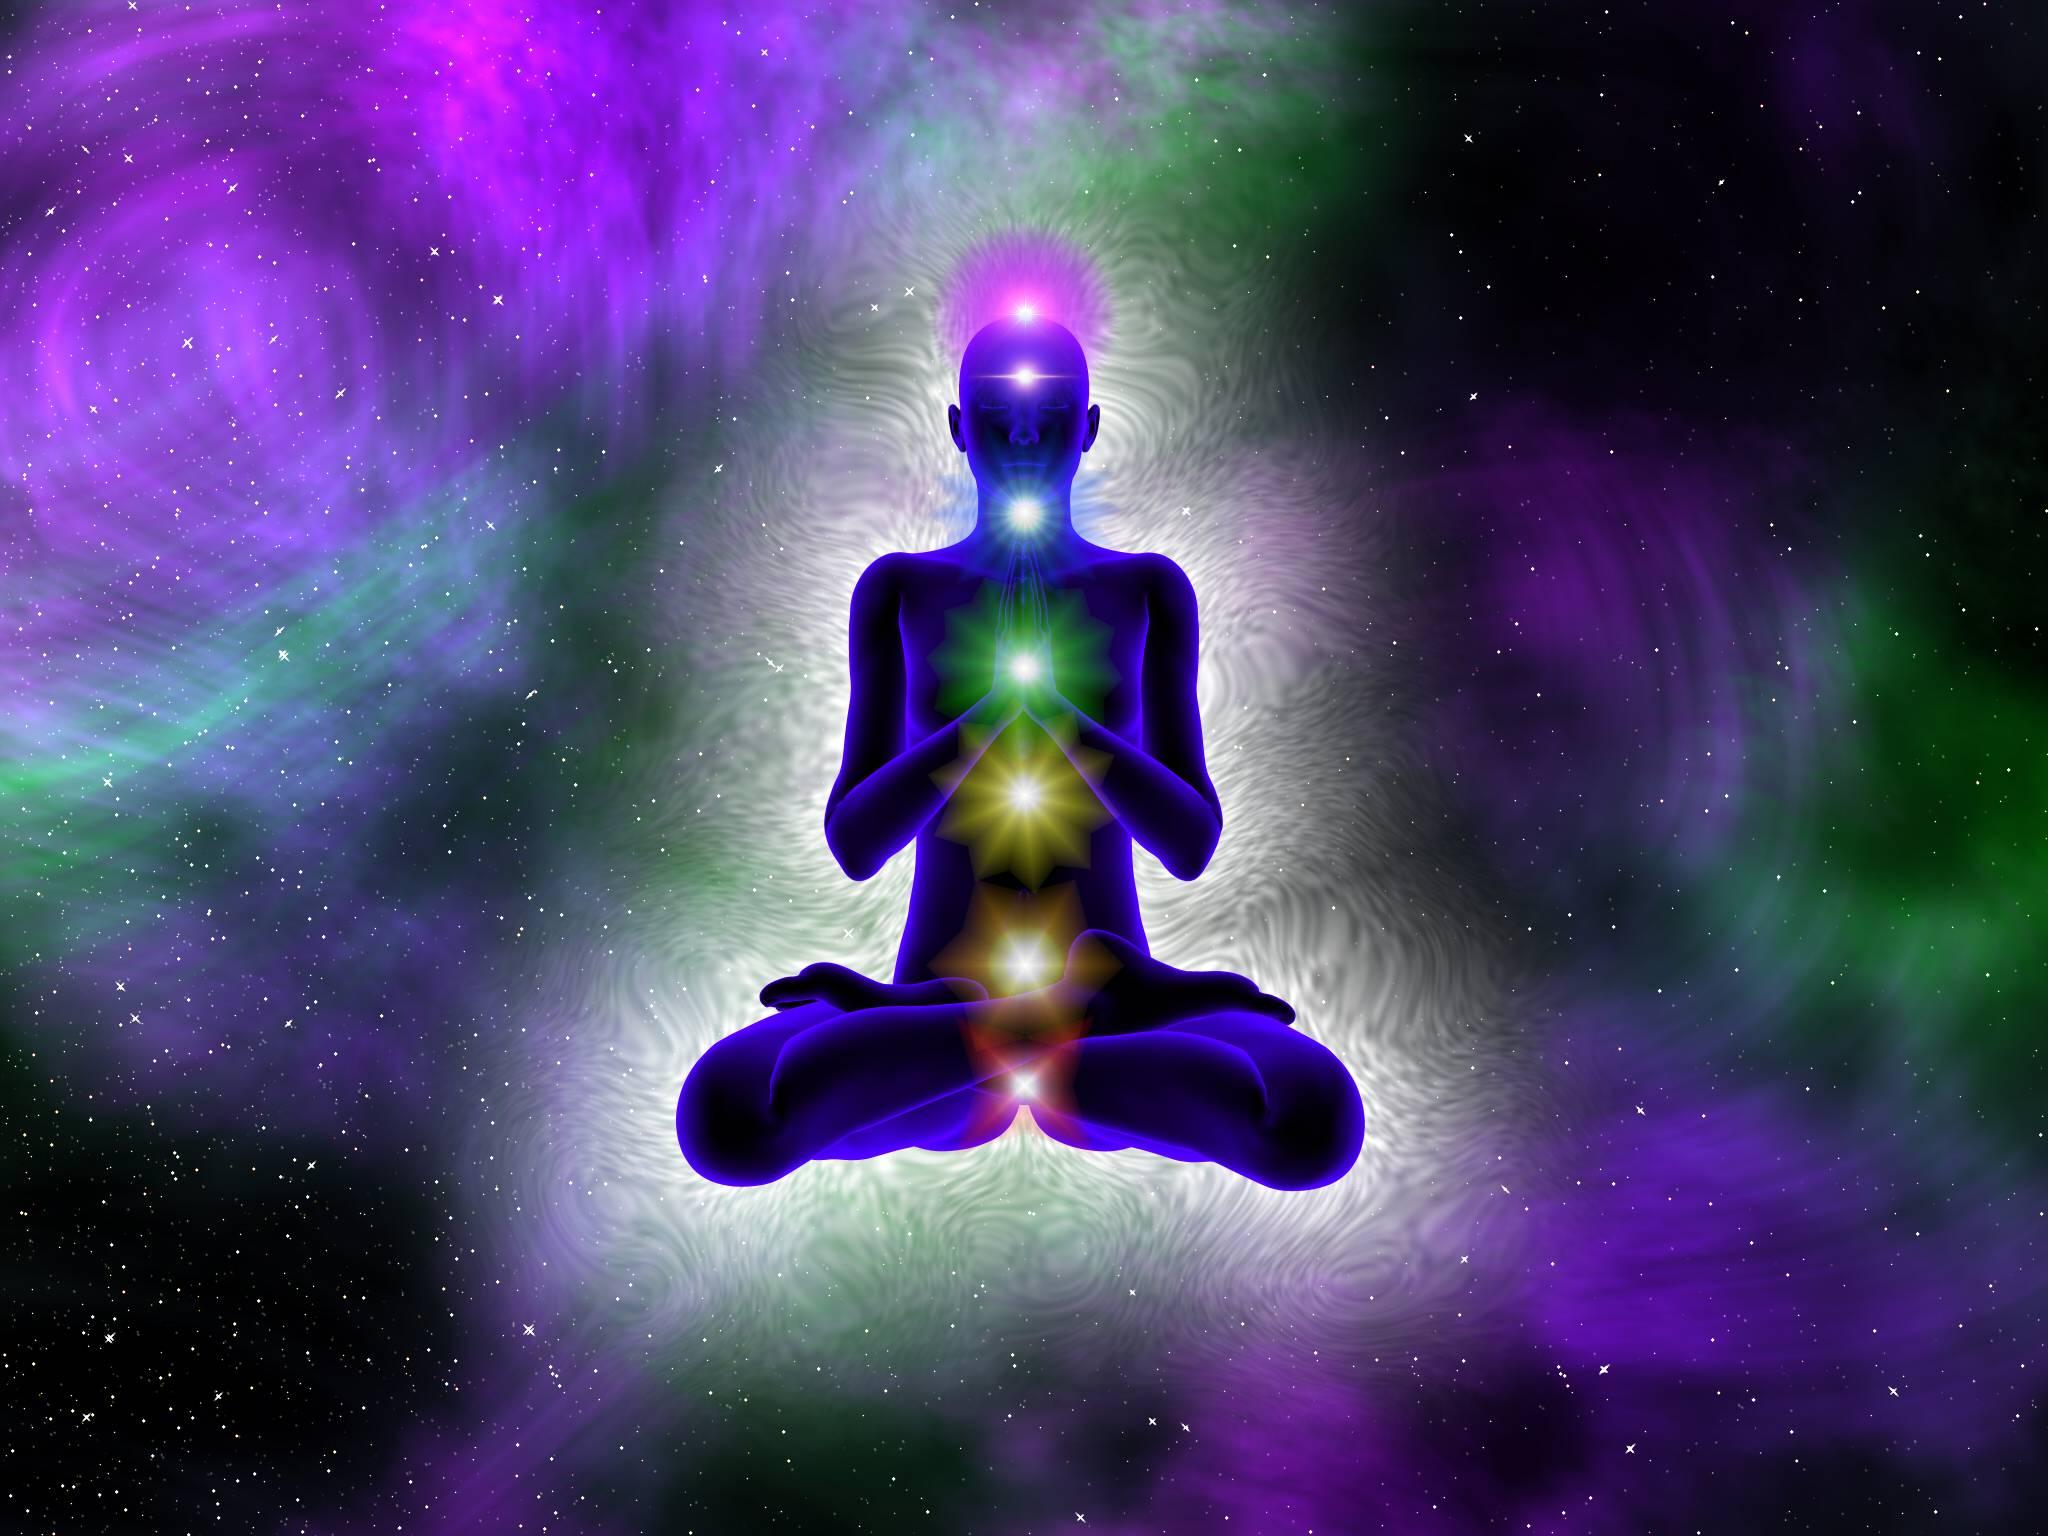 медитация на успех гиф видел